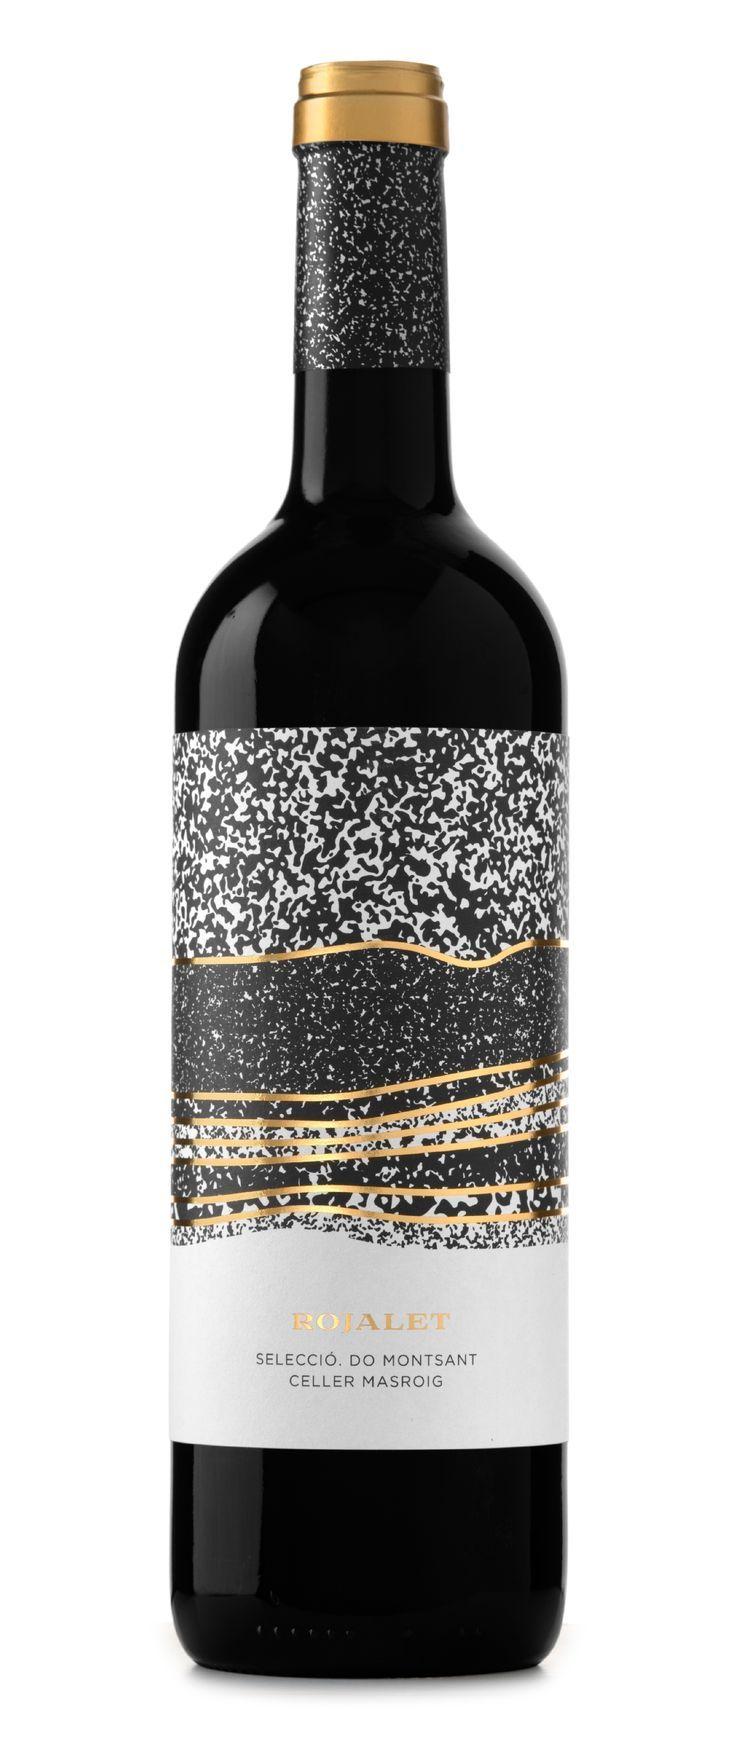 rojalet wine | http://www.thedieline.com/blog/2015/9/1/rojalet-wines